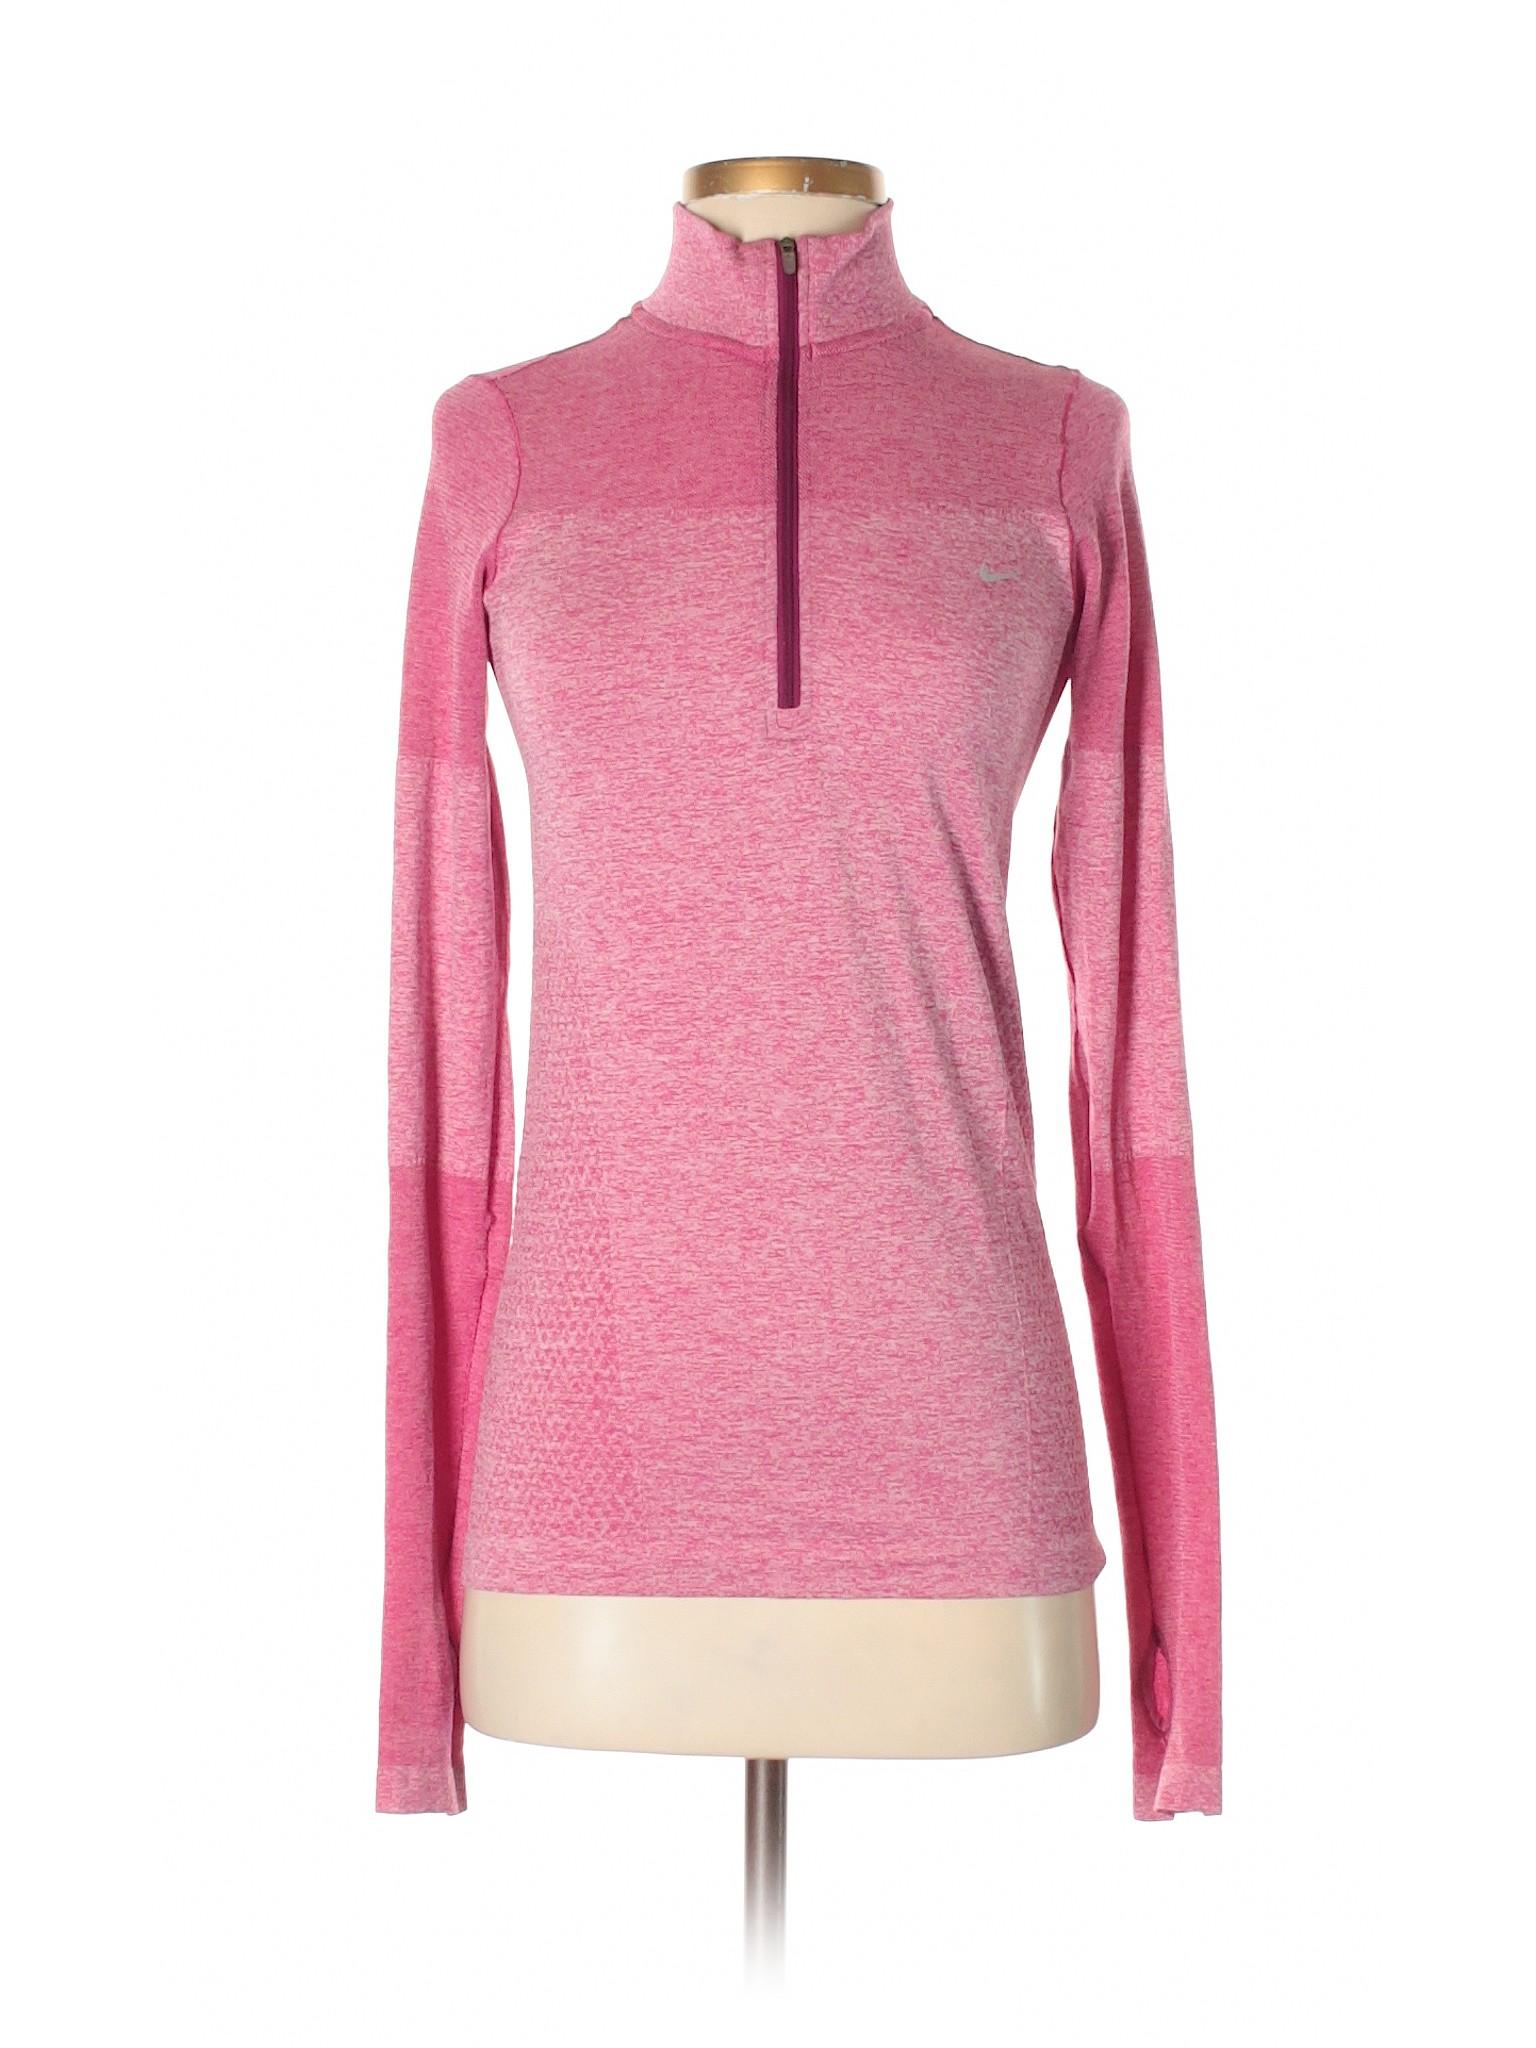 Boutique Boutique winter Jacket winter Track Nike wYwqrU